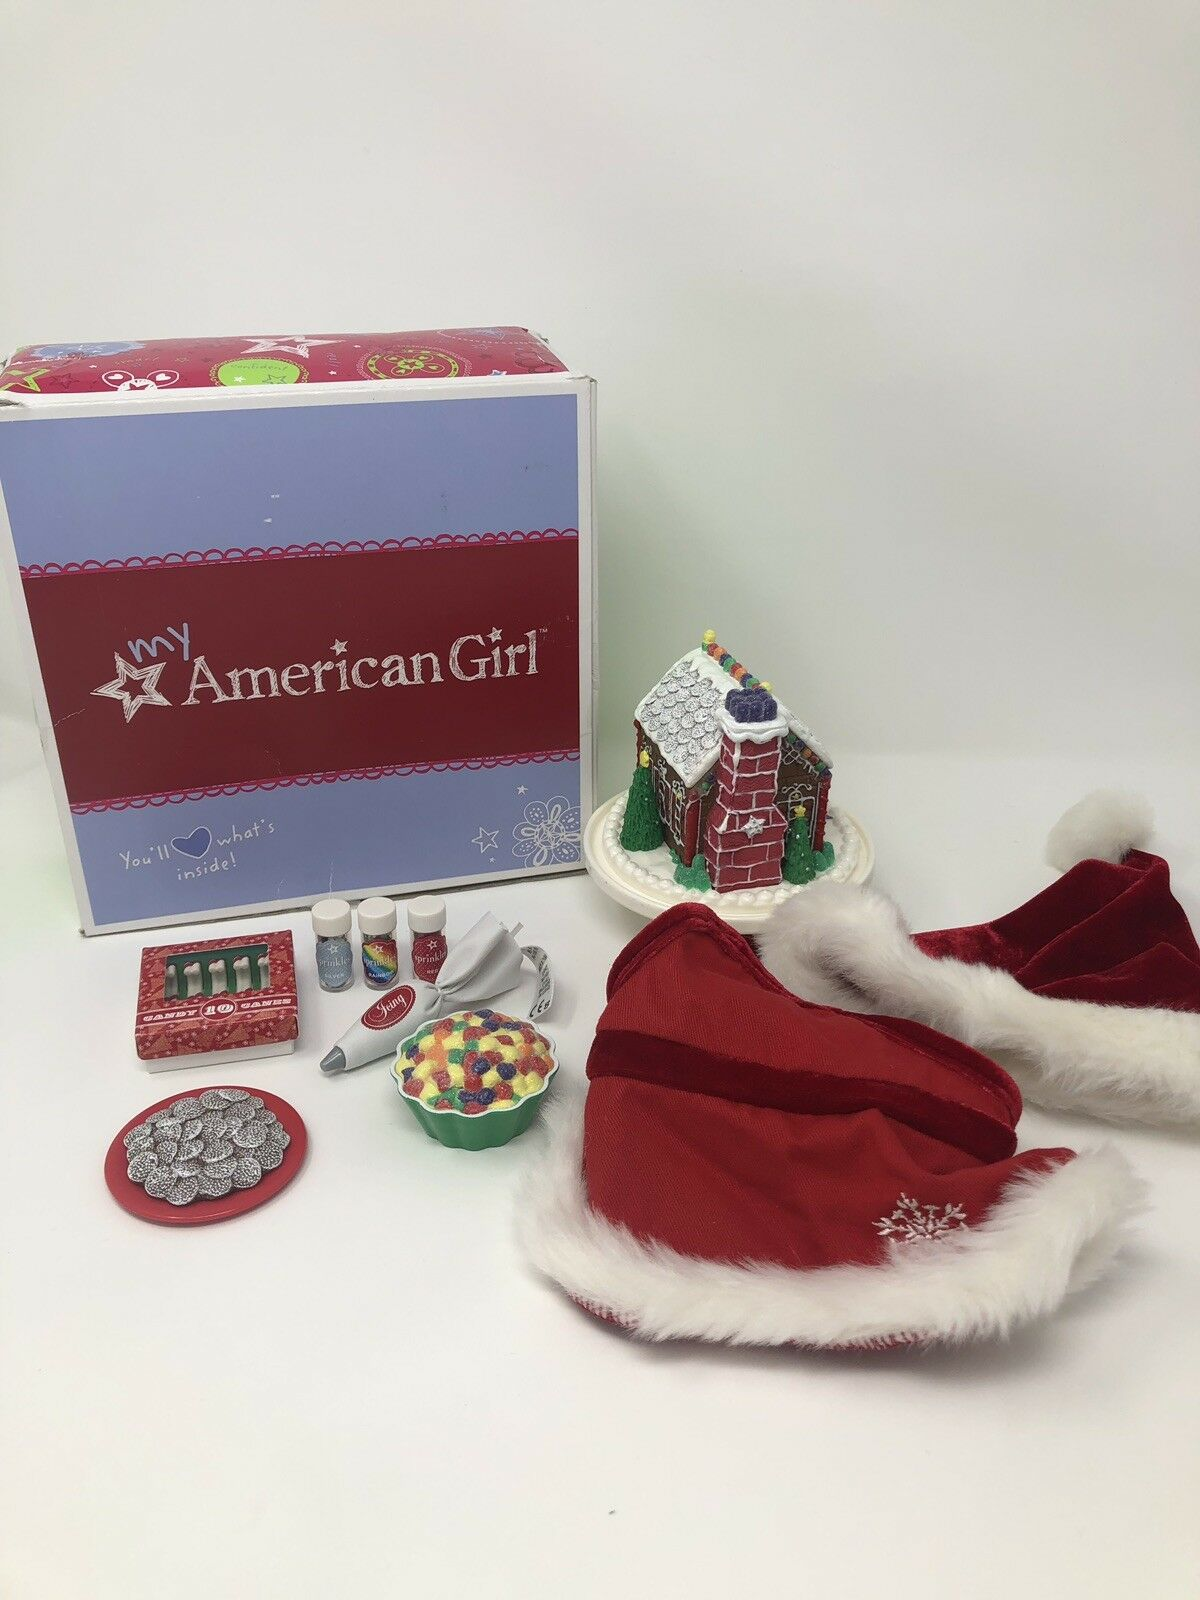 American Girl Doll Sugar & Spice Holiday Baking Baking Baking Set and Holiday Treat Set EUC b368d1